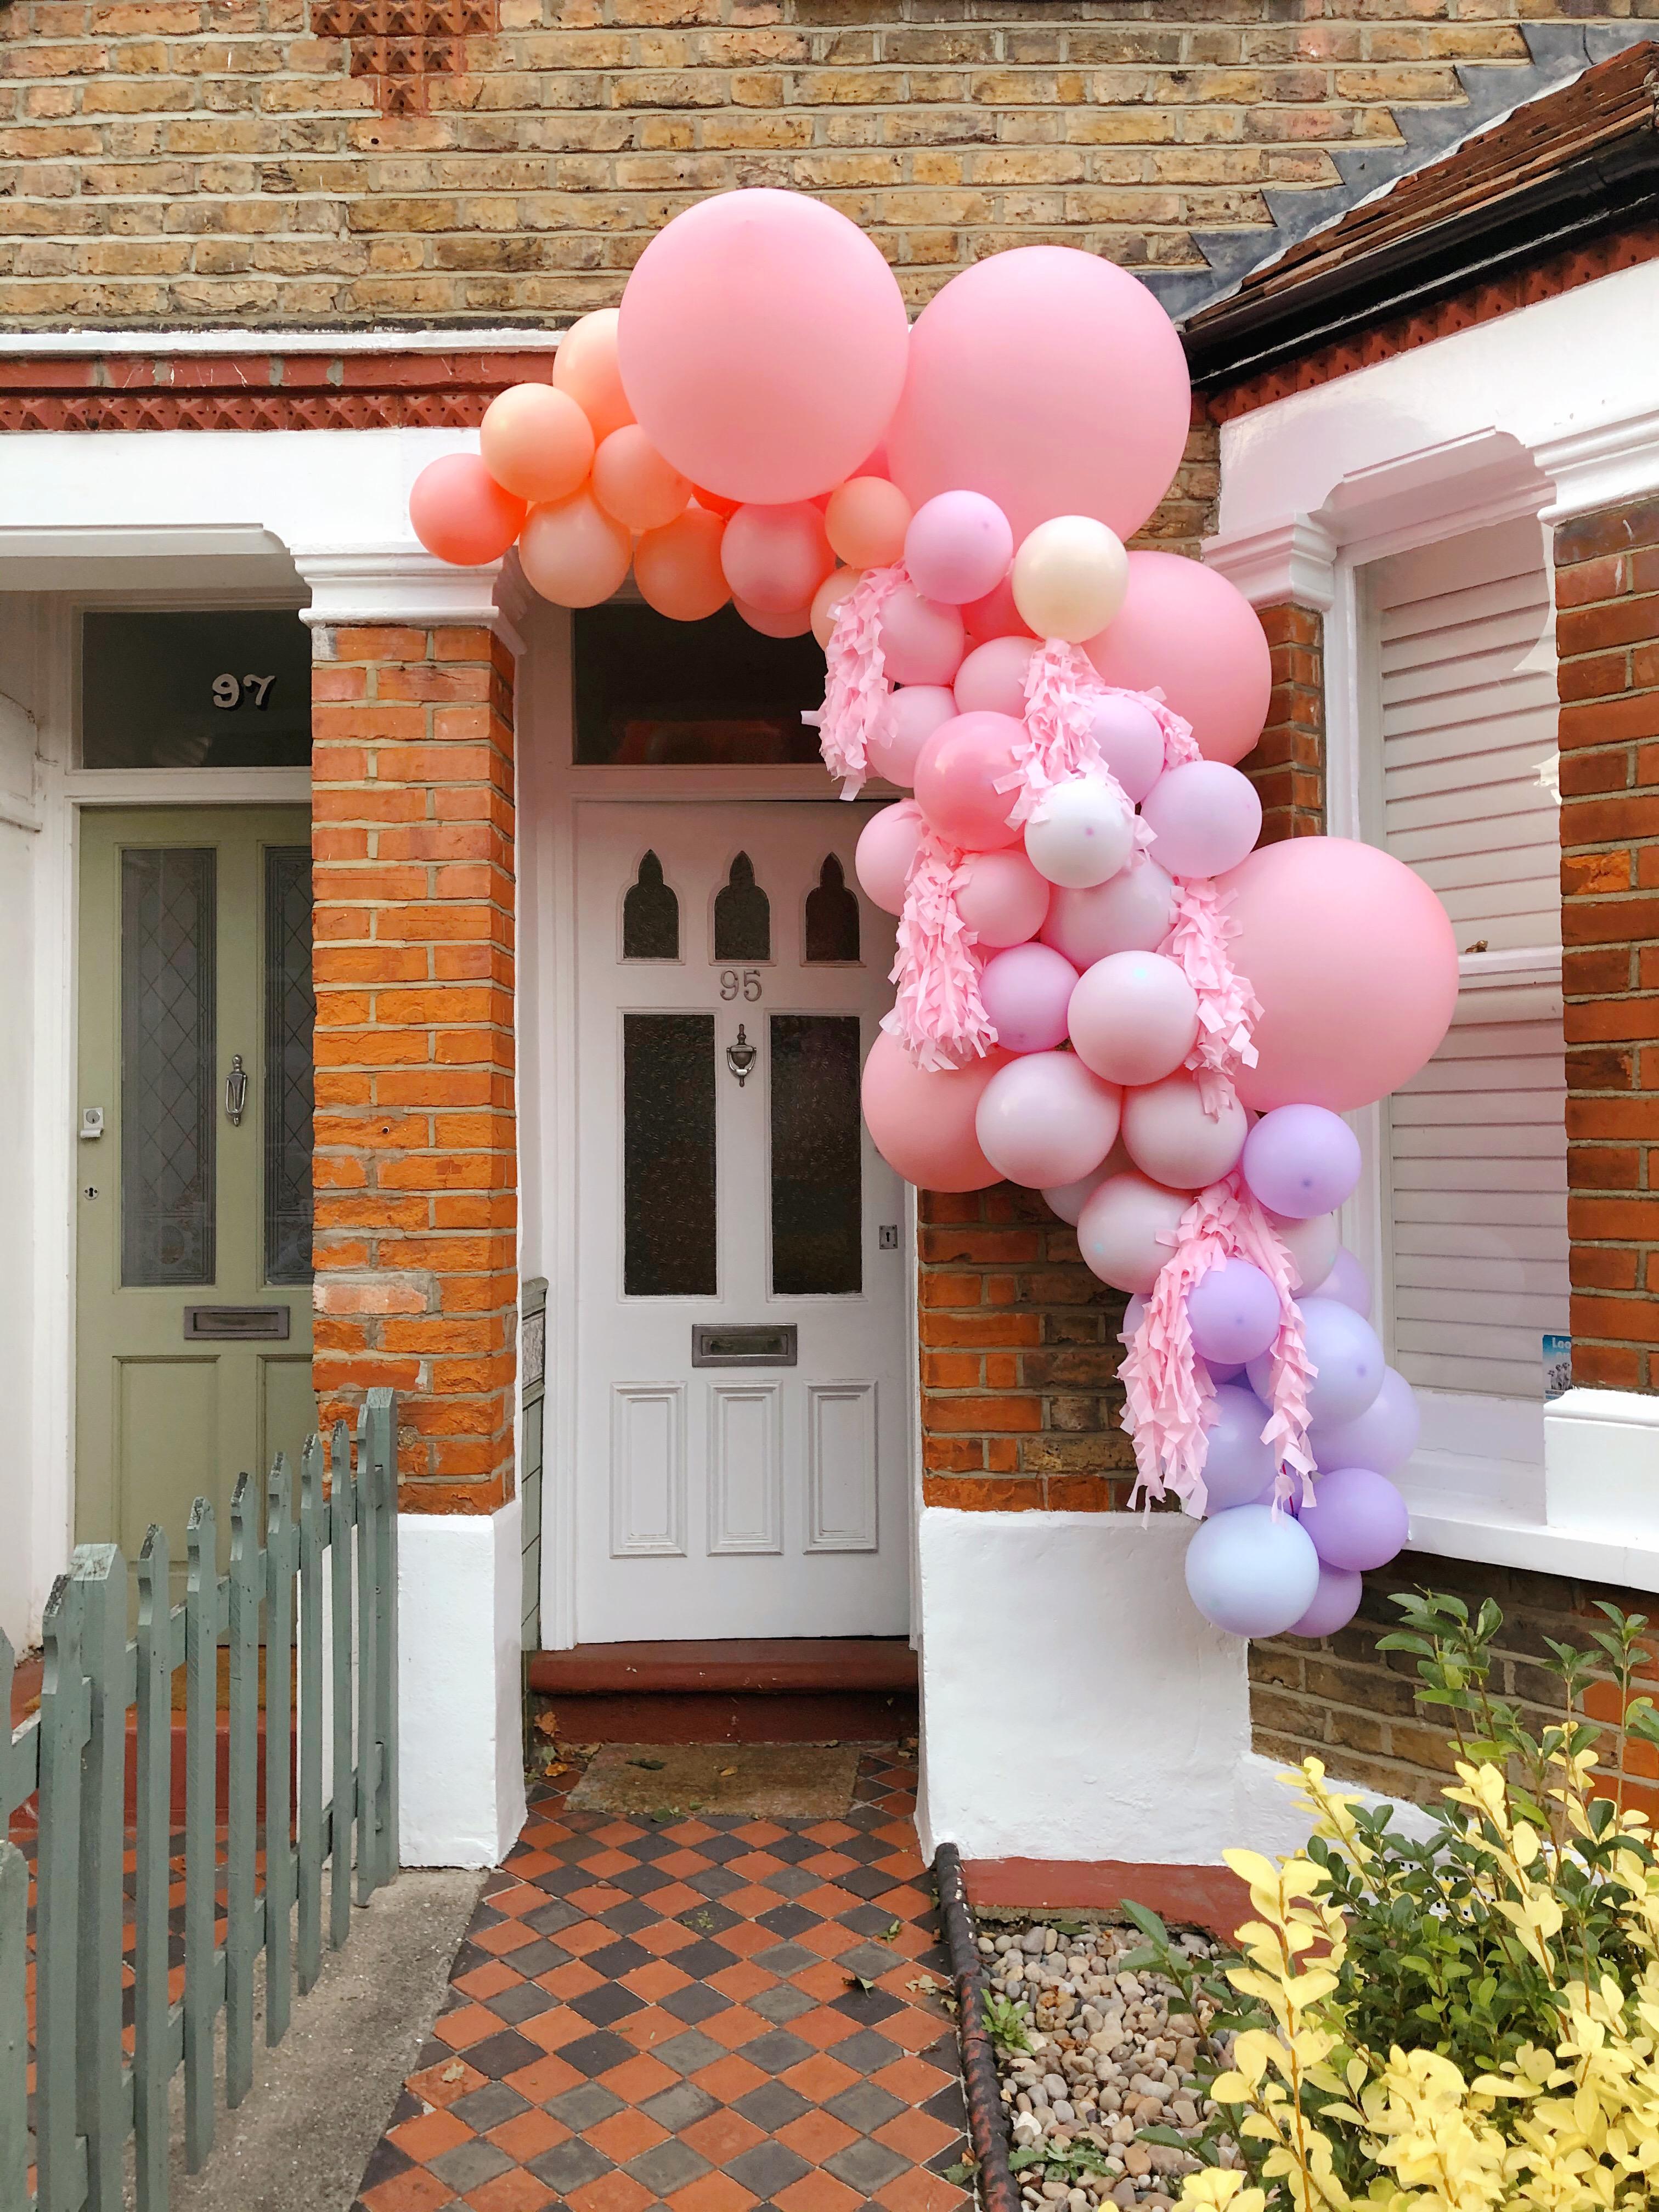 balloon garland, colorful, art installation